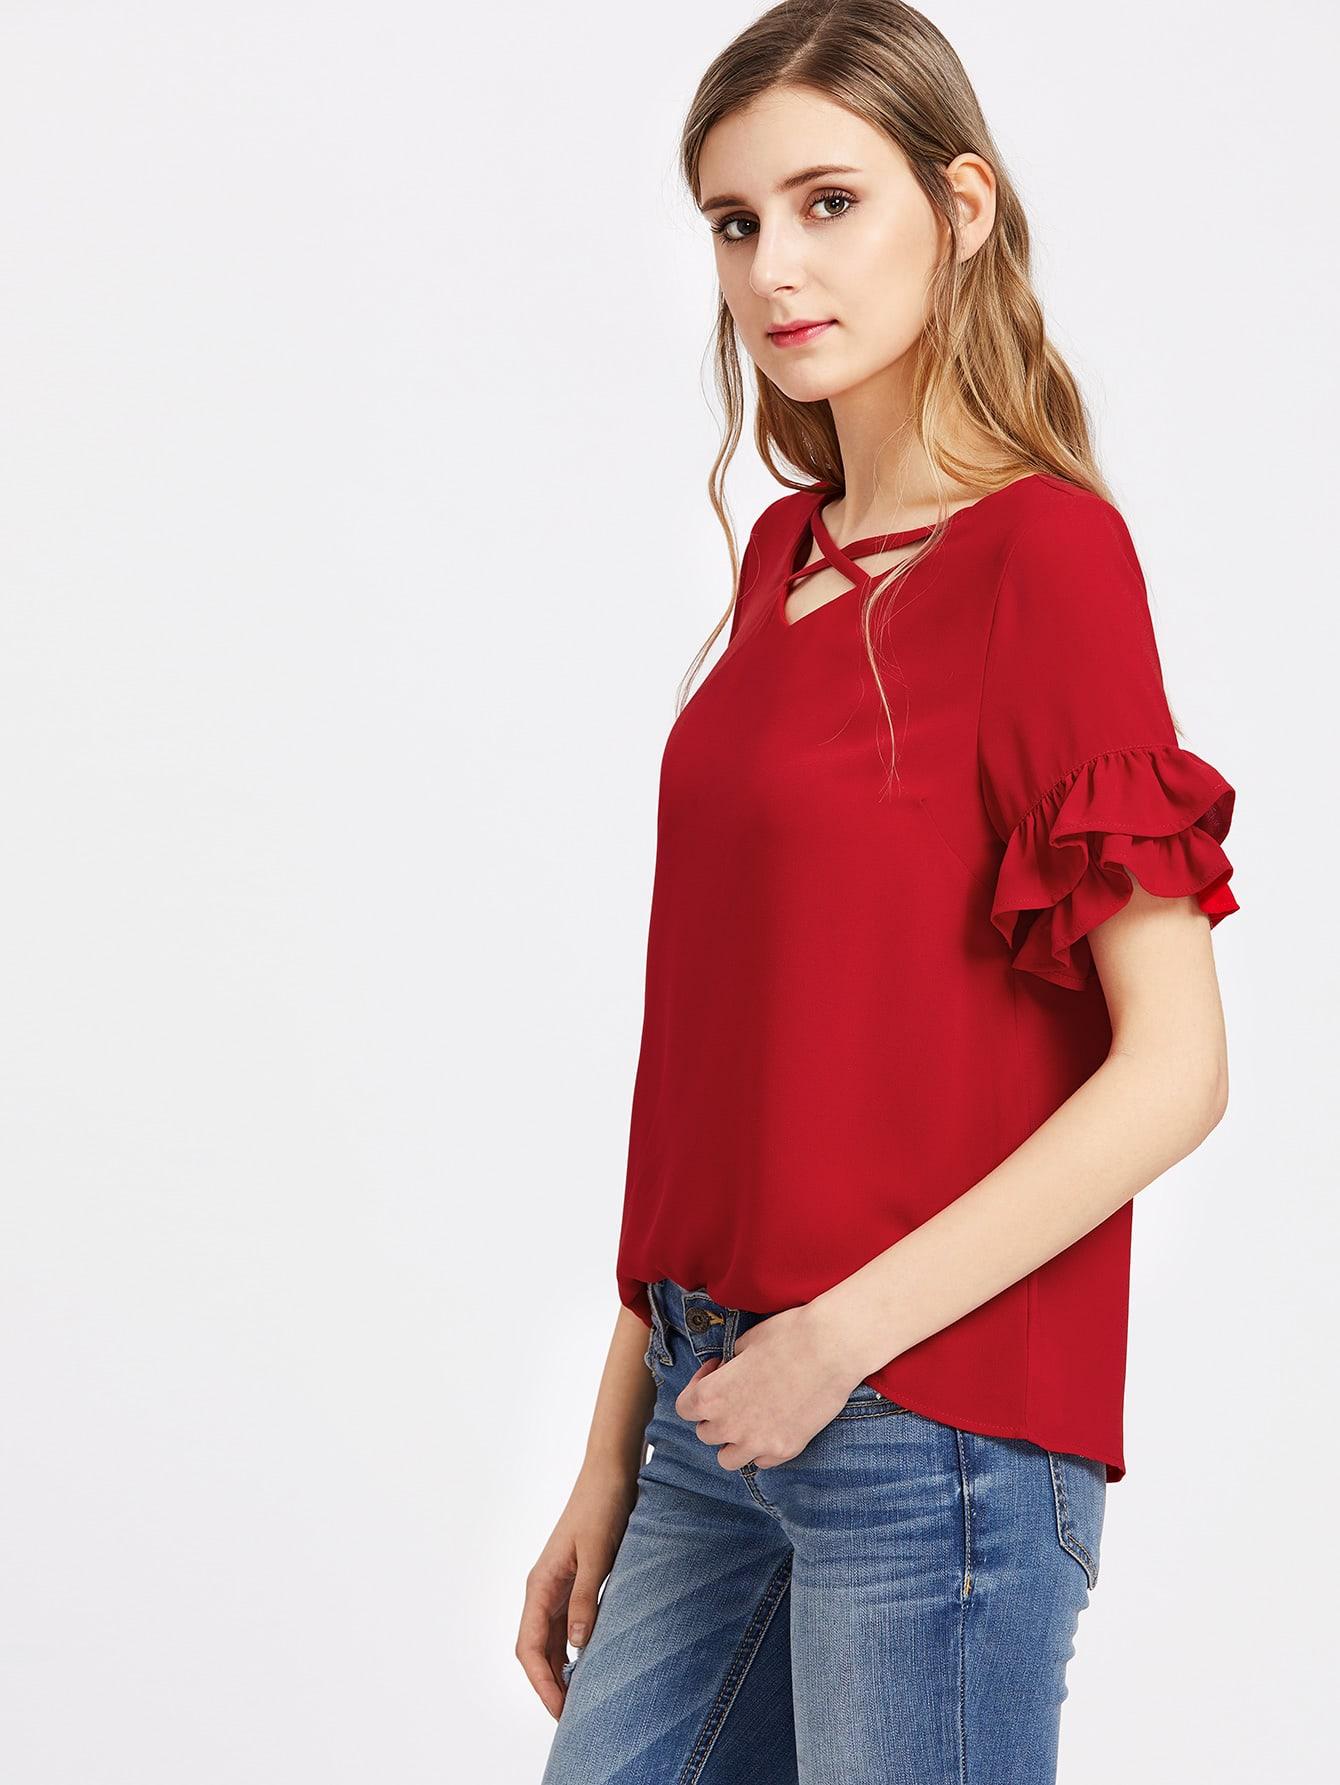 blouse170331457_2